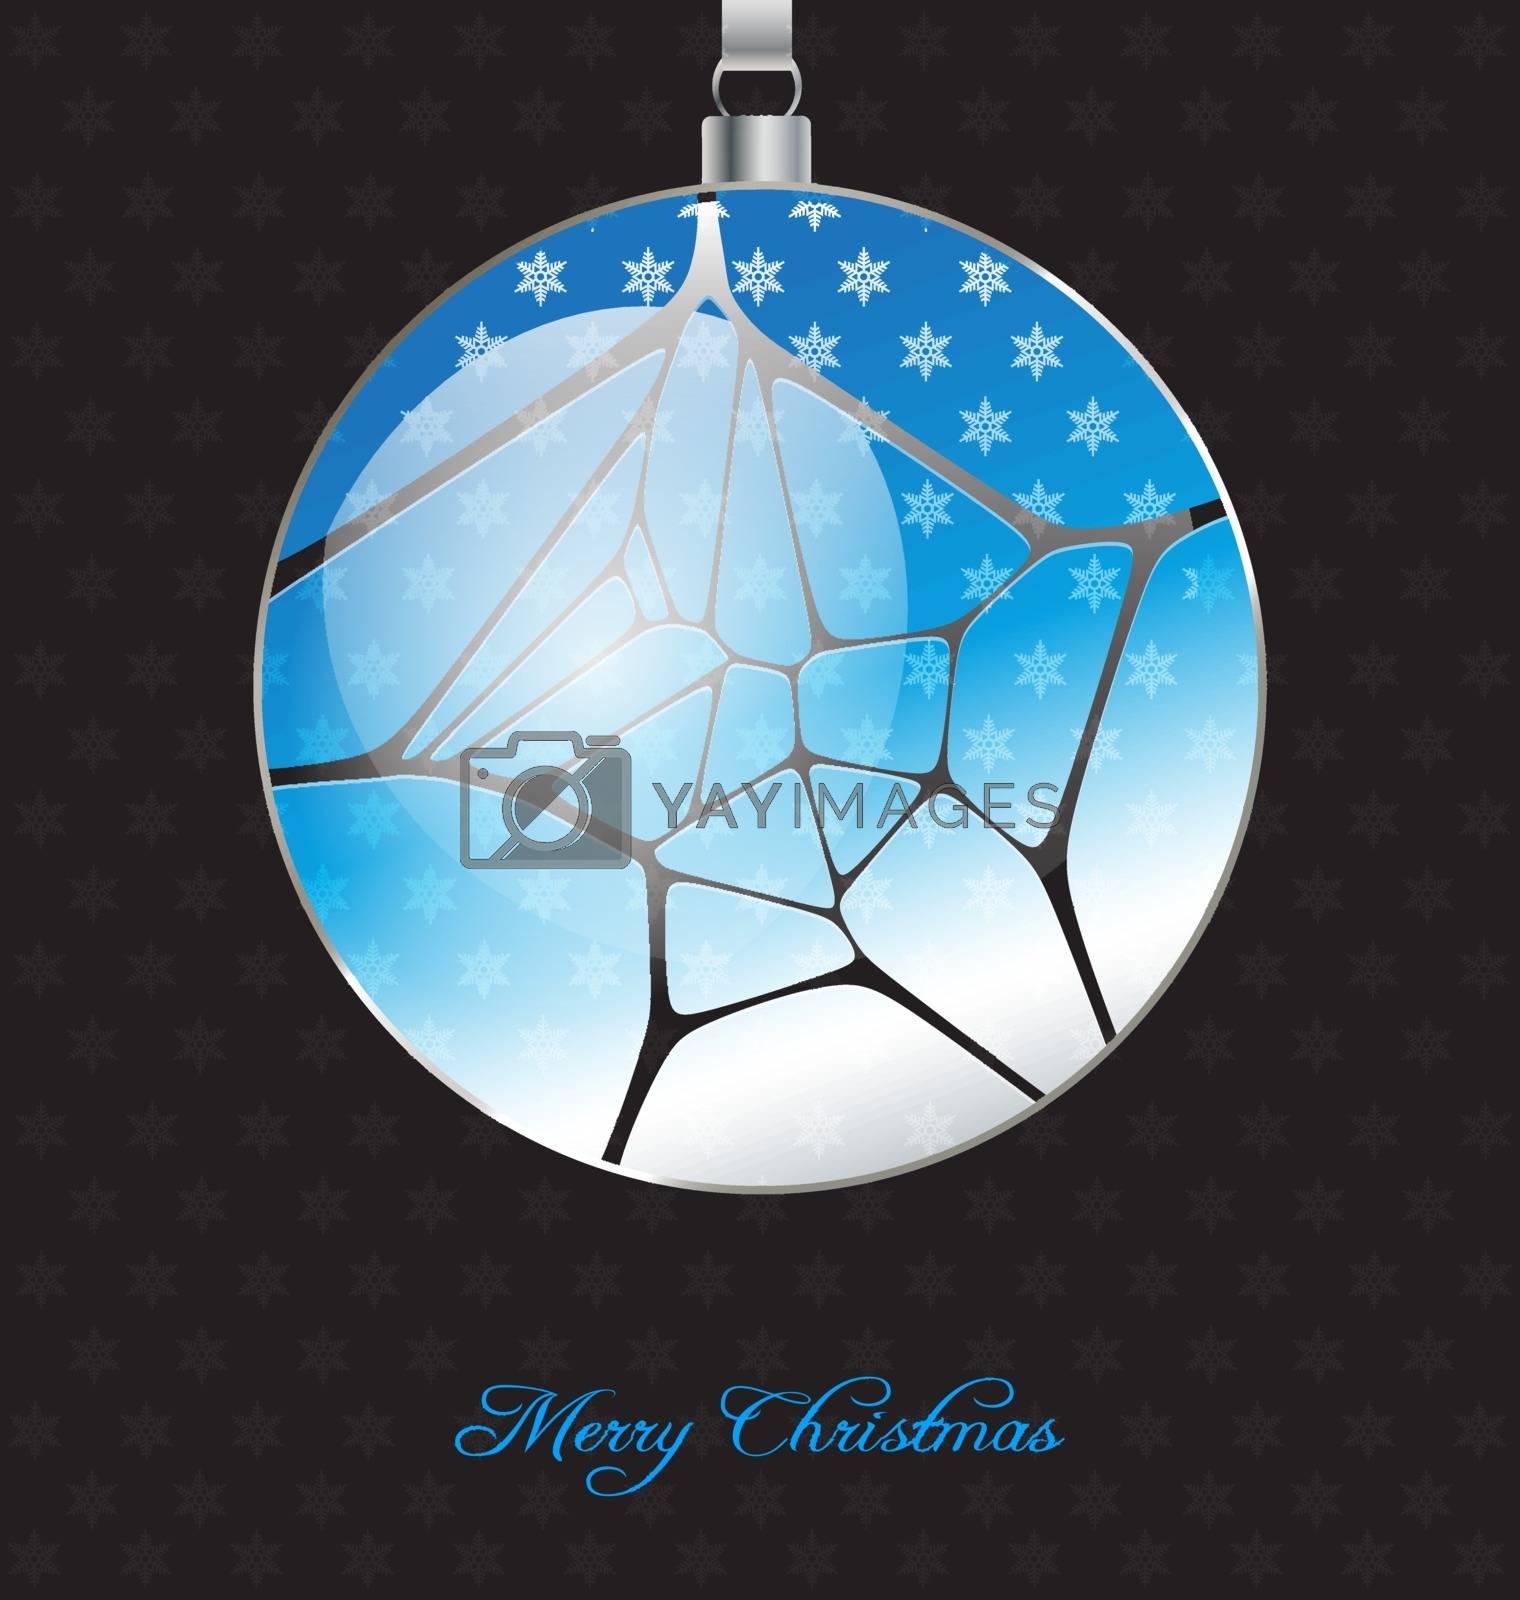 Elegant christmas background with glossy christmas ball embellishment for creative design